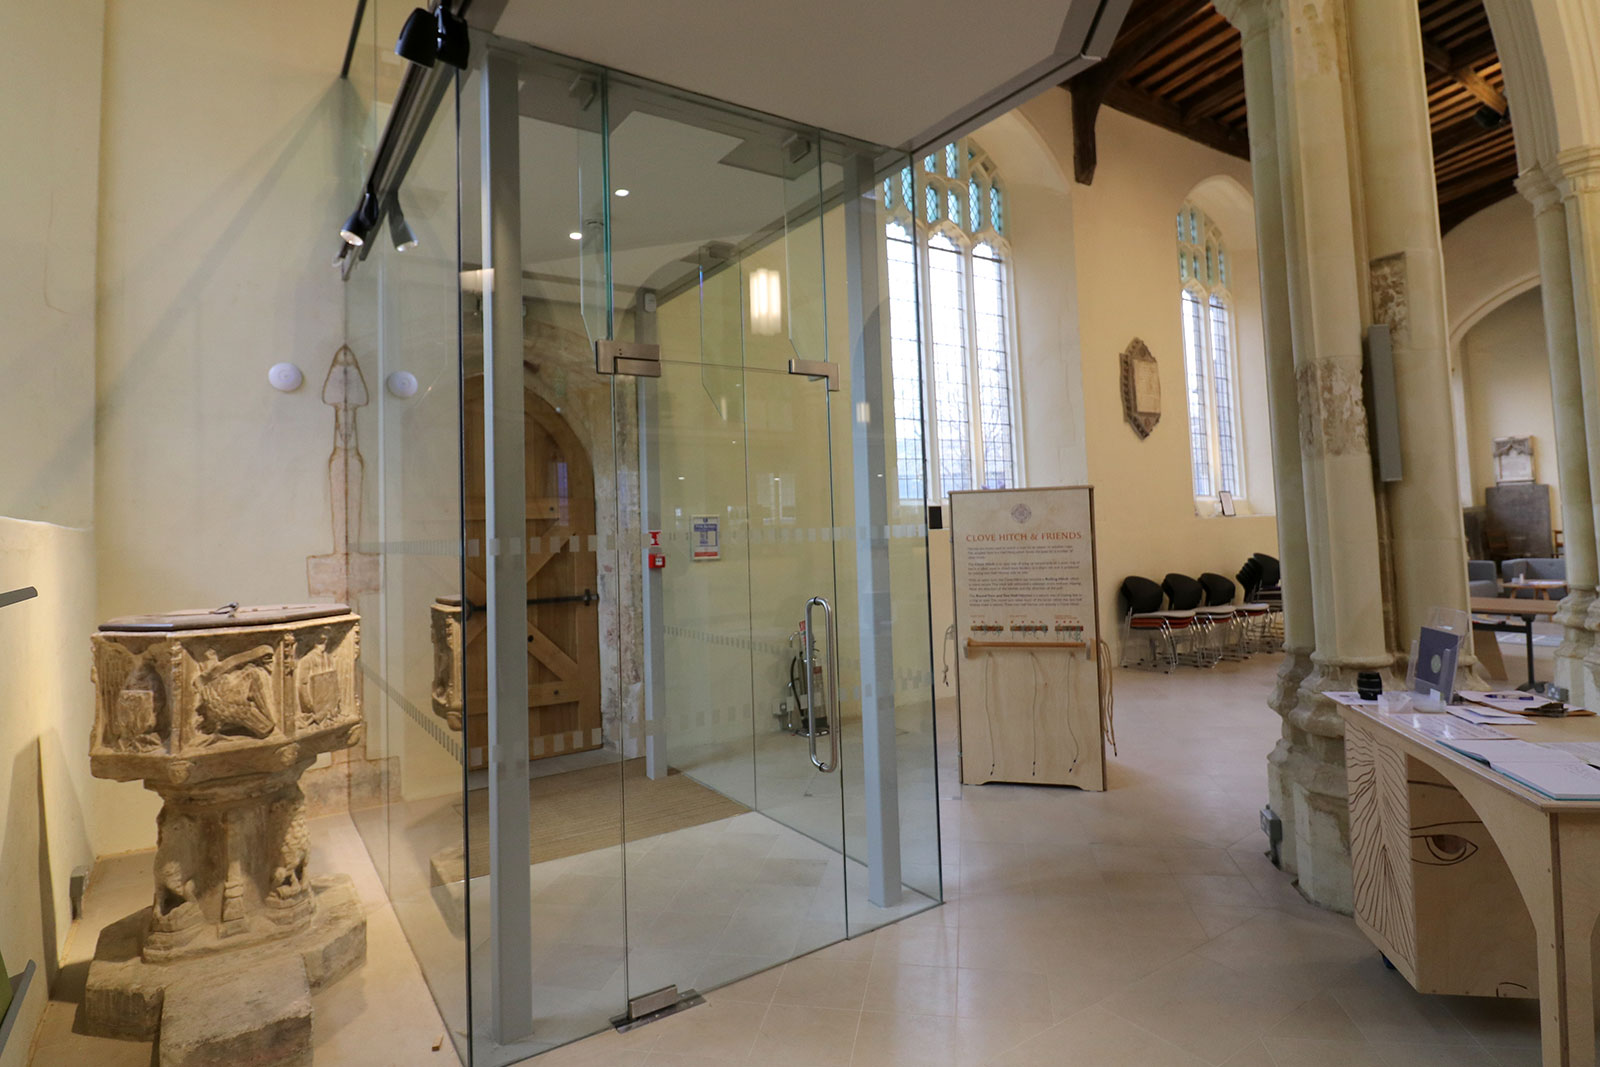 Bespoke Glass Lobby Area and Entrance Screens